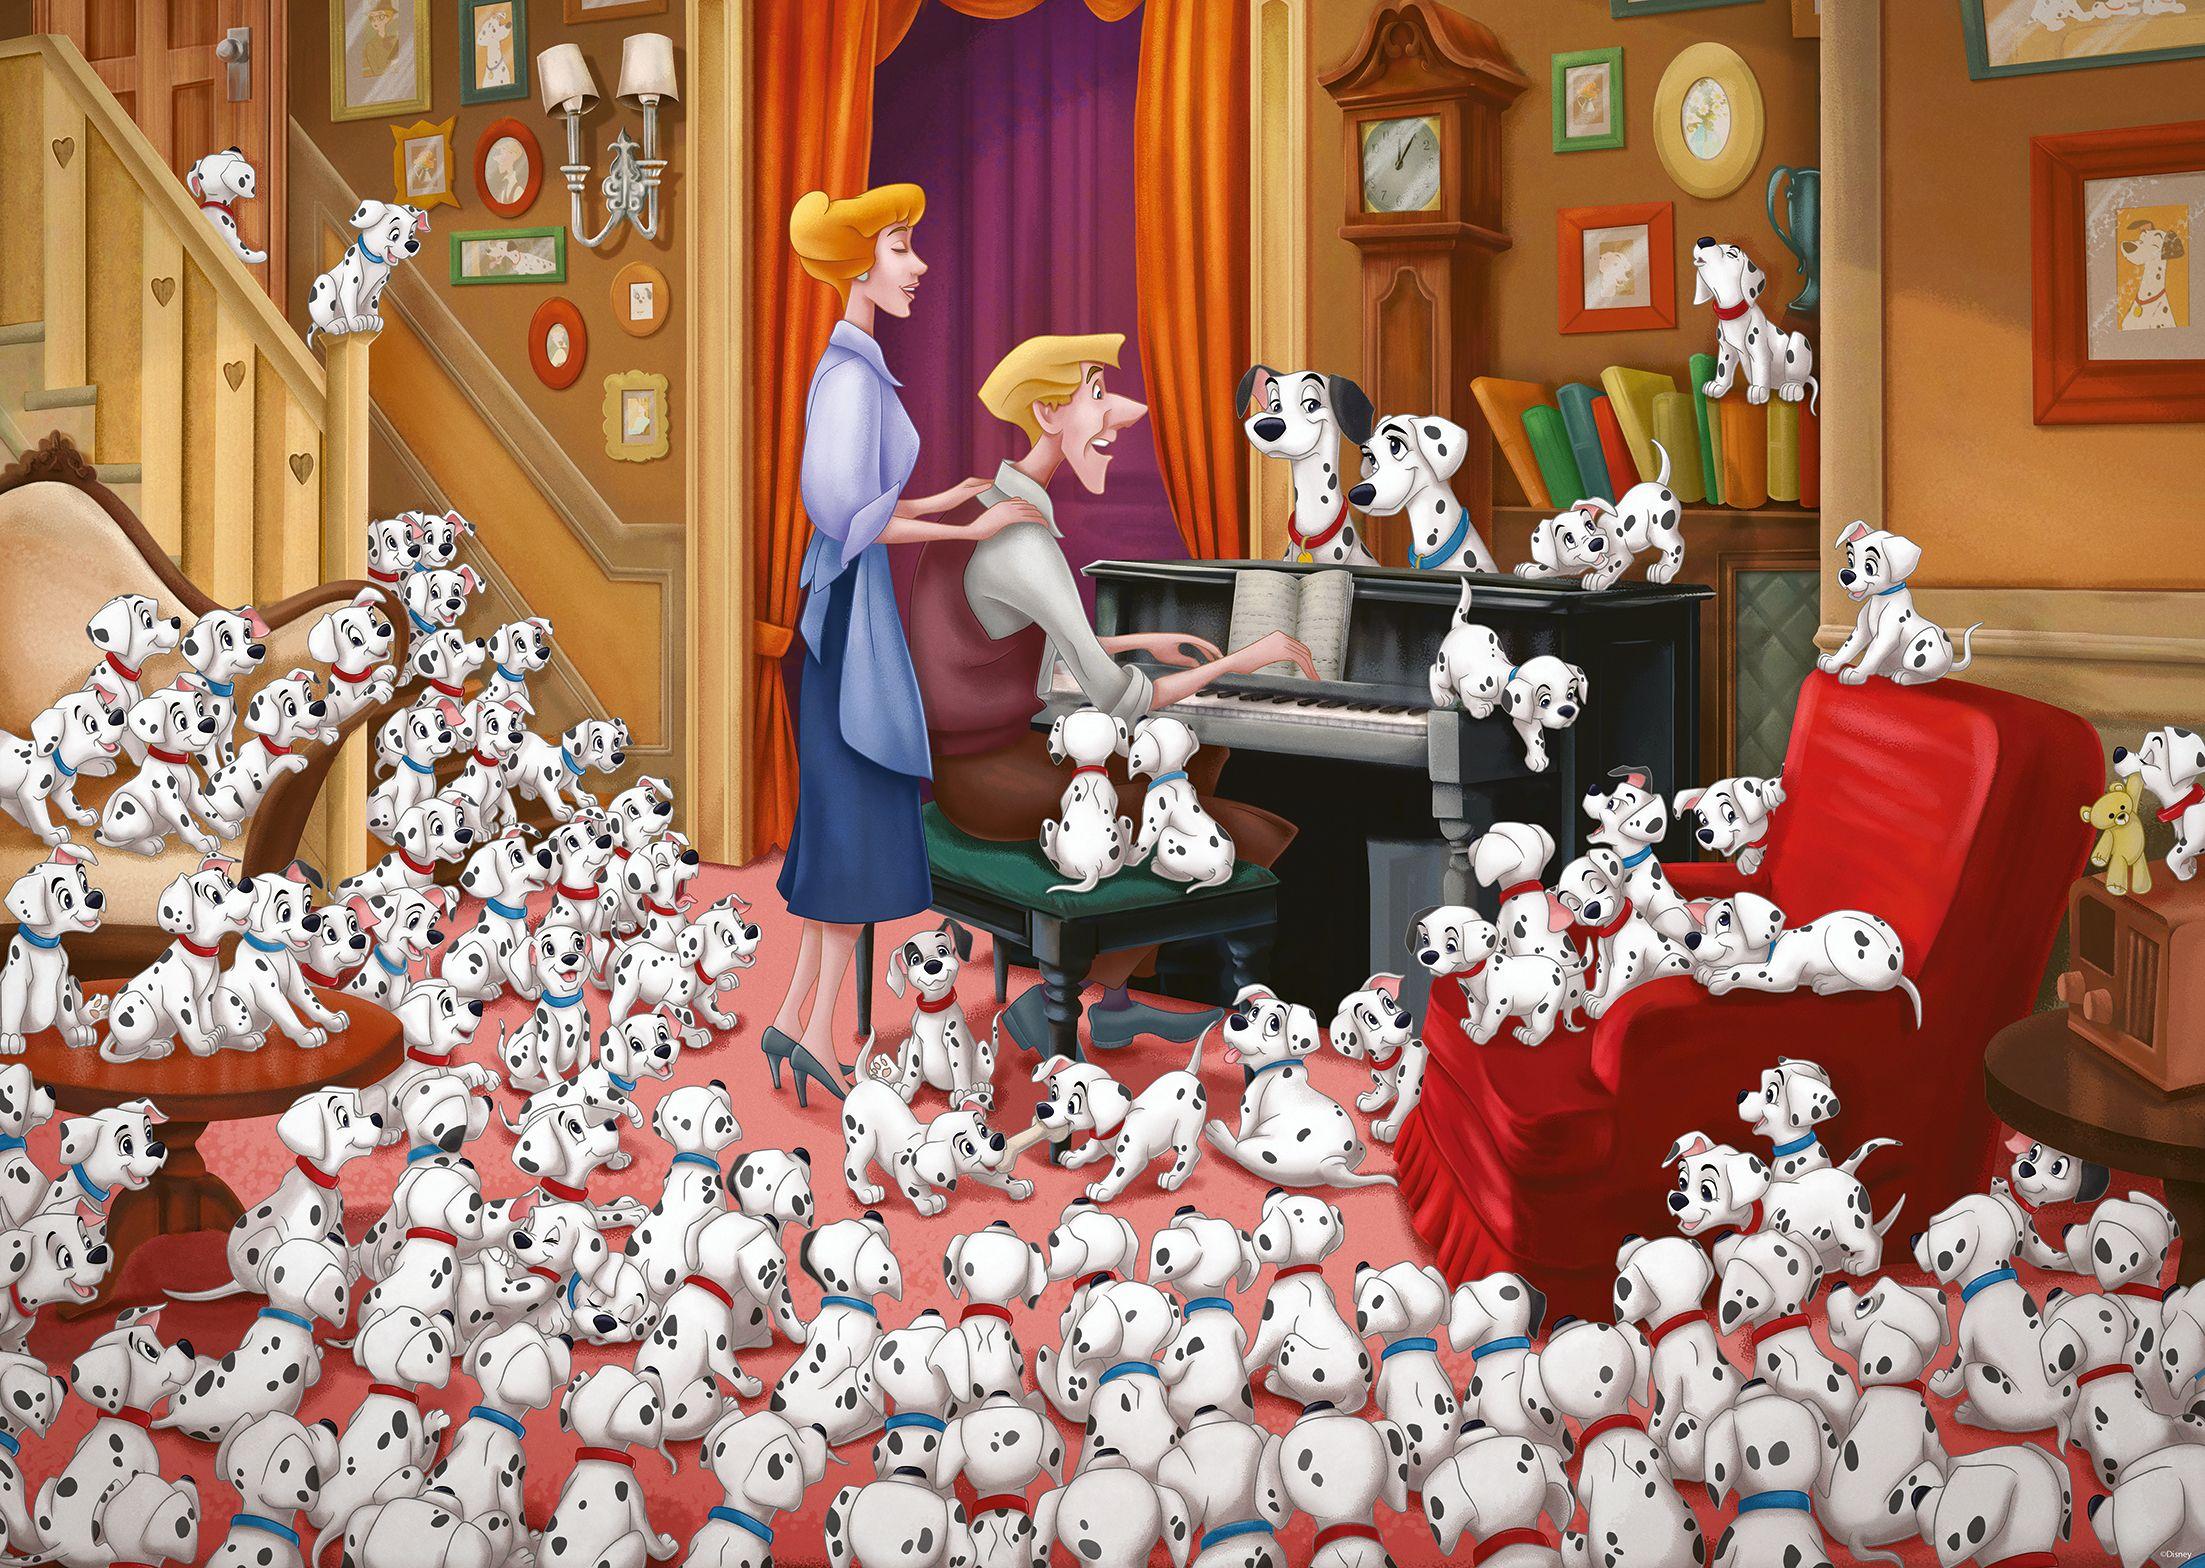 101 Dalmatians Disney Jigsaw Puzzle